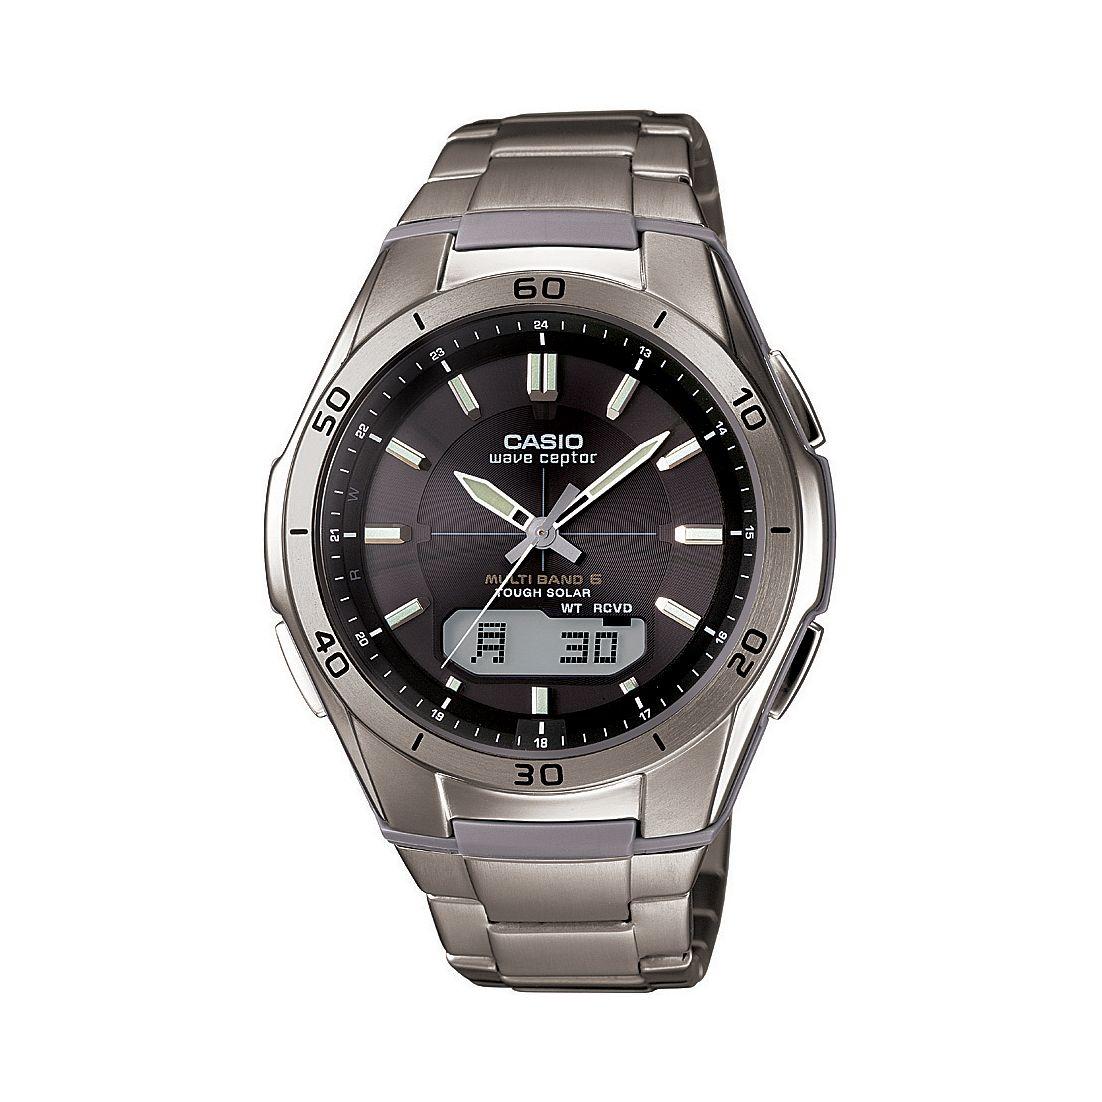 Casio Men's Radio Controlled solar powered Titanium Watch 100m WR £94 delivered @ H Samuel